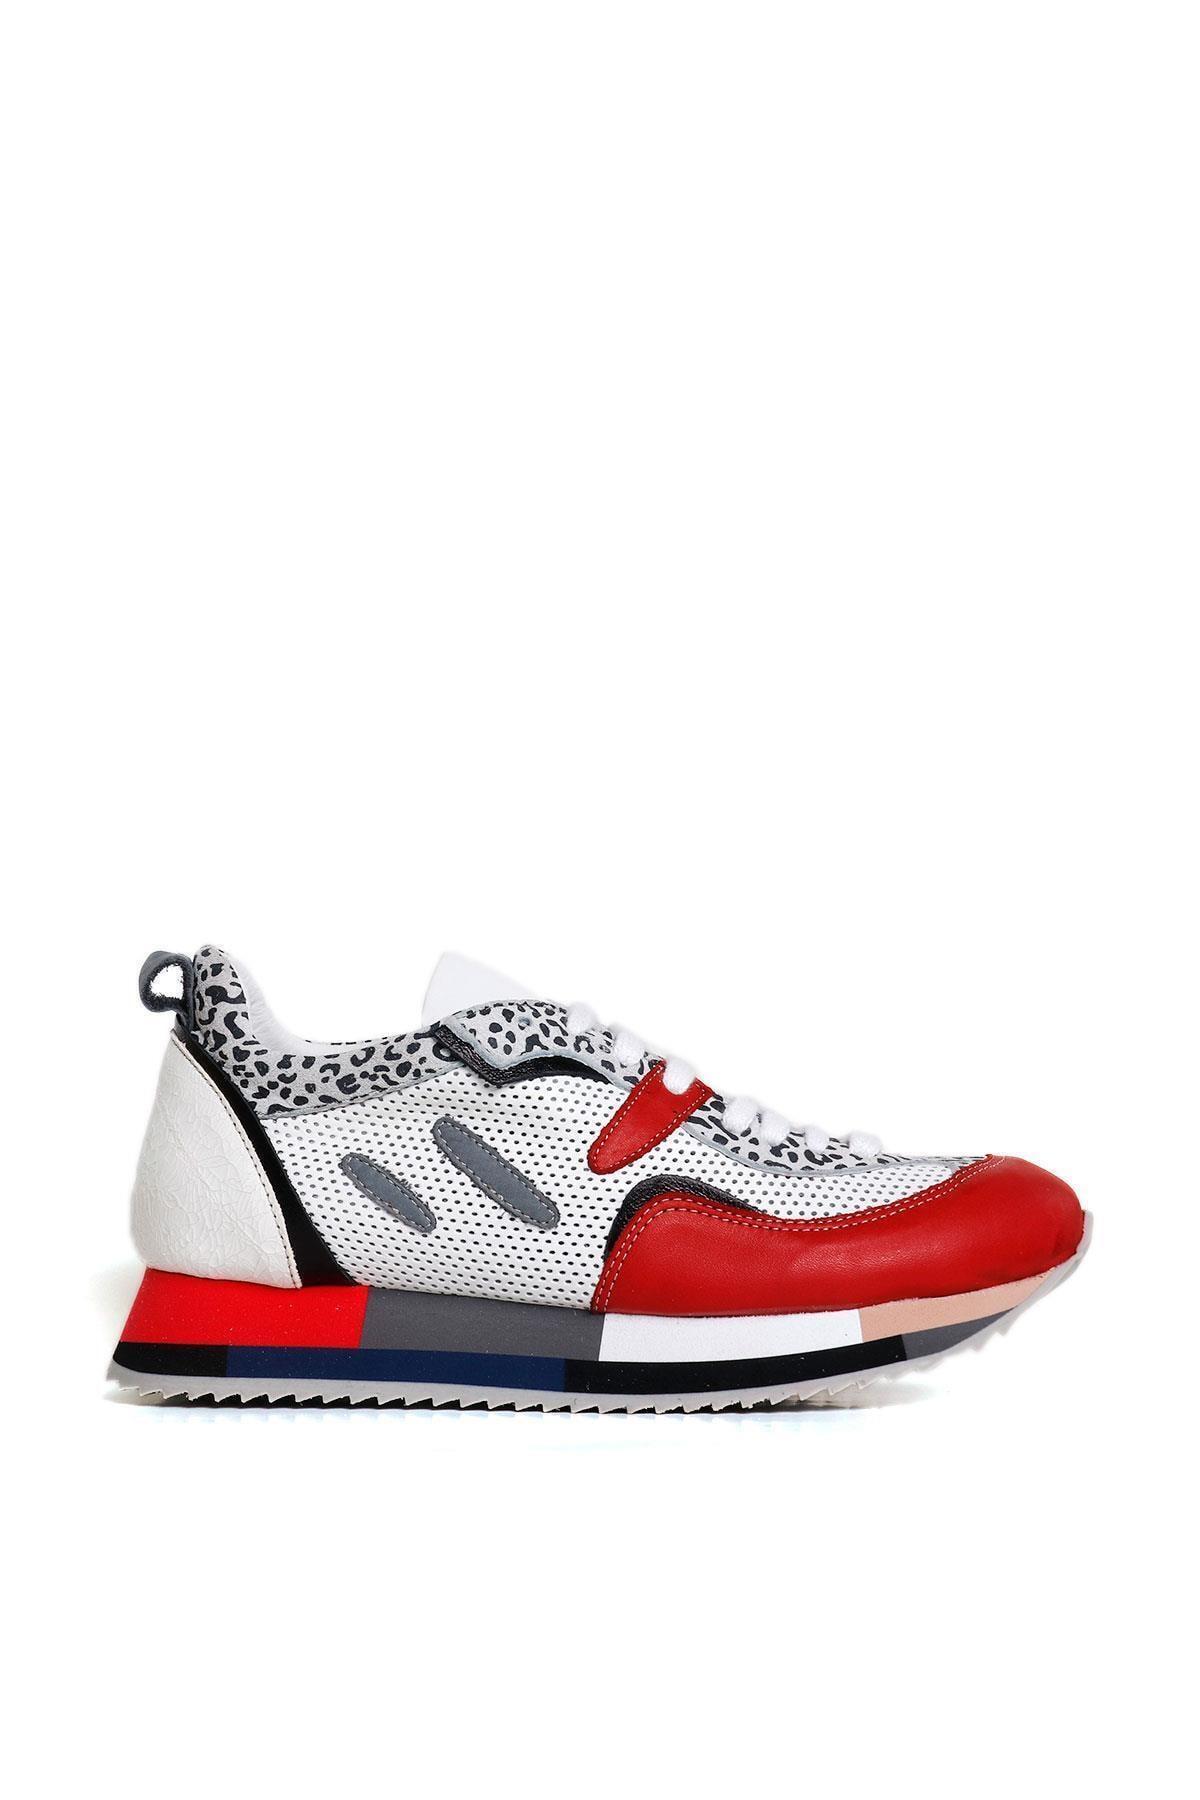 BUENO Shoes Kadın Spor 20wq5403 1